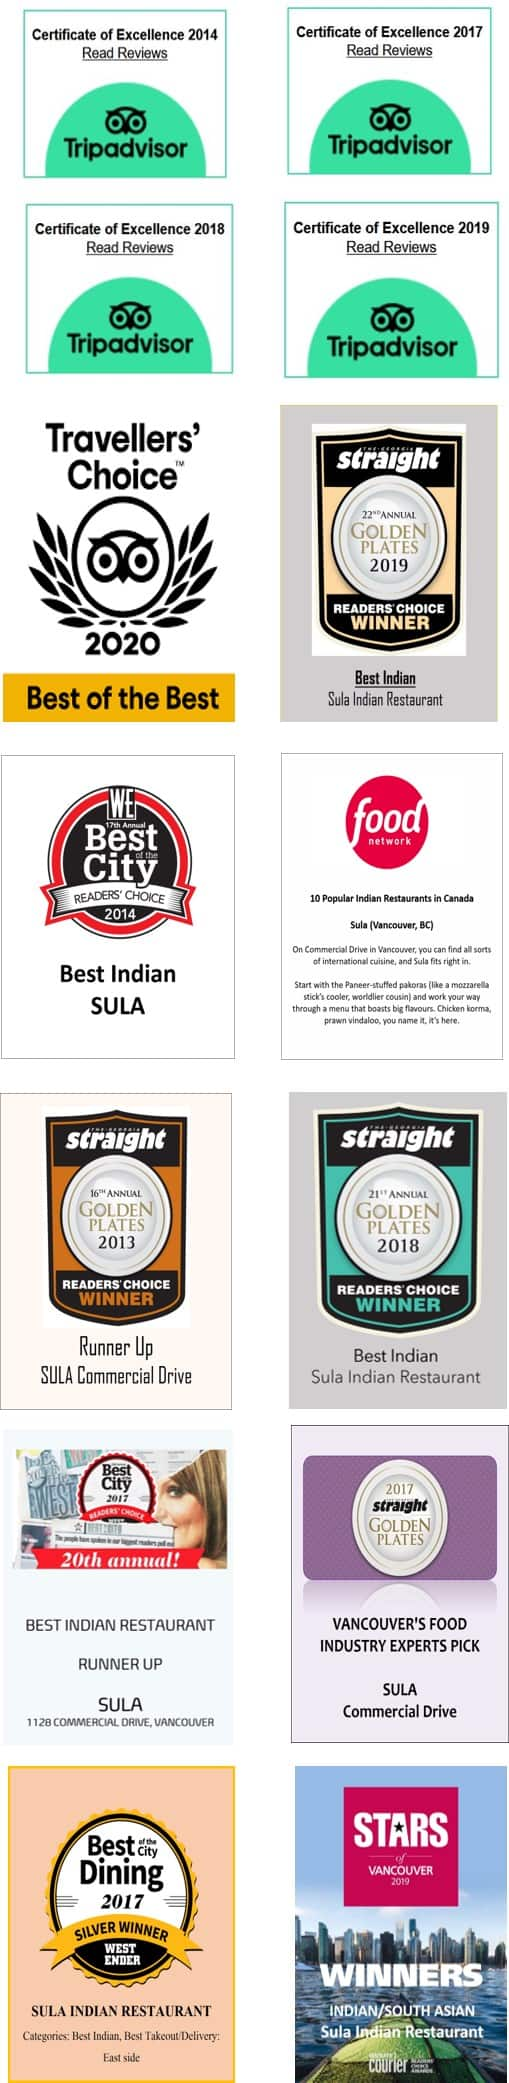 Sula Indian Restaurant Awards